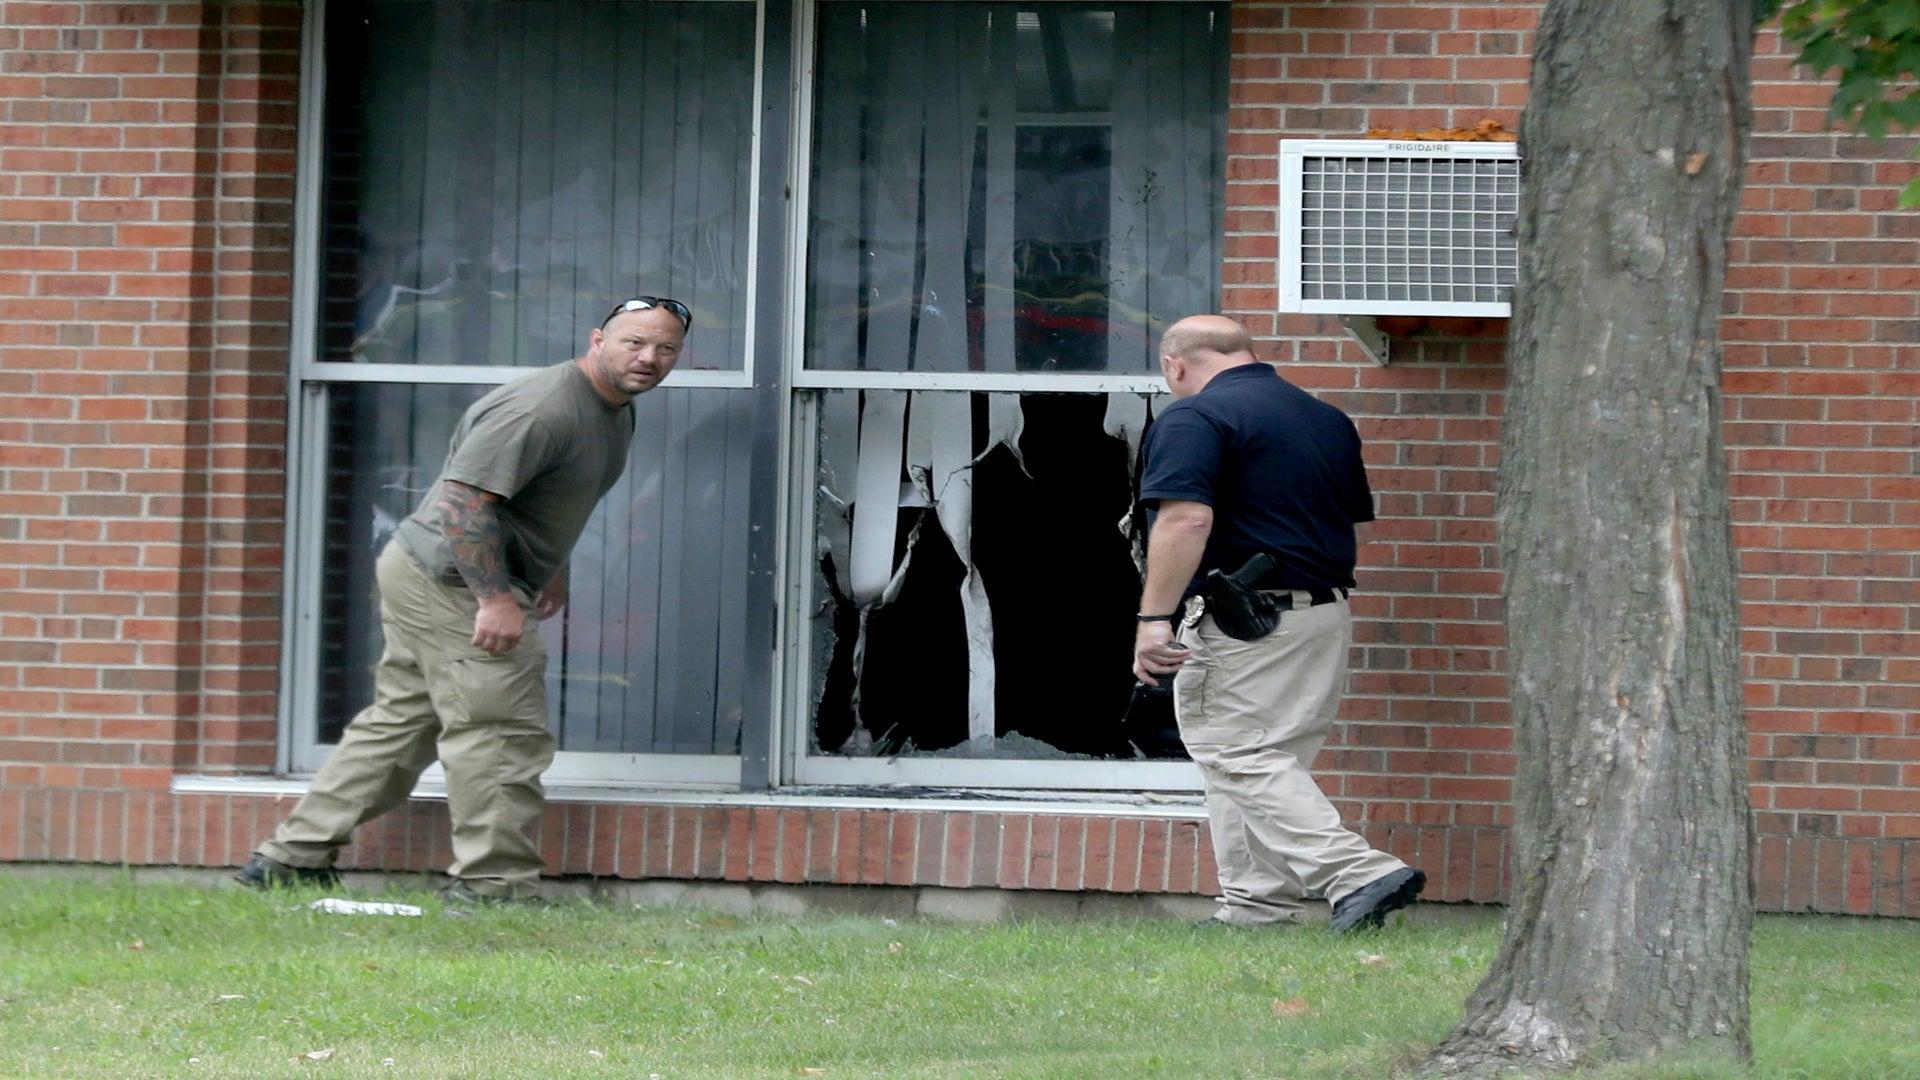 Someone Threw a Bomb Through a Mosque Window in Minnesota